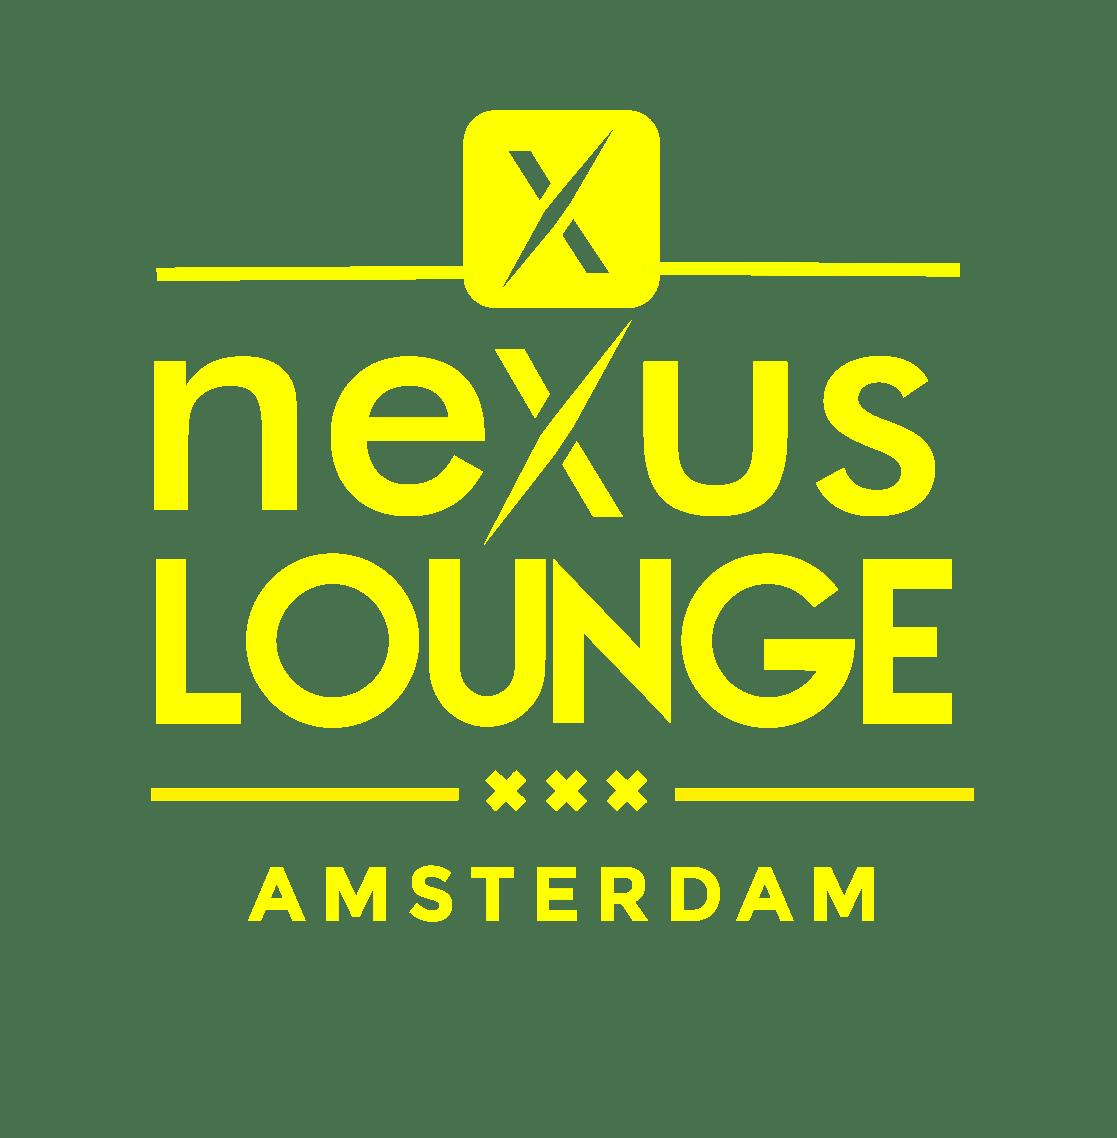 nexus lounge ade yellow